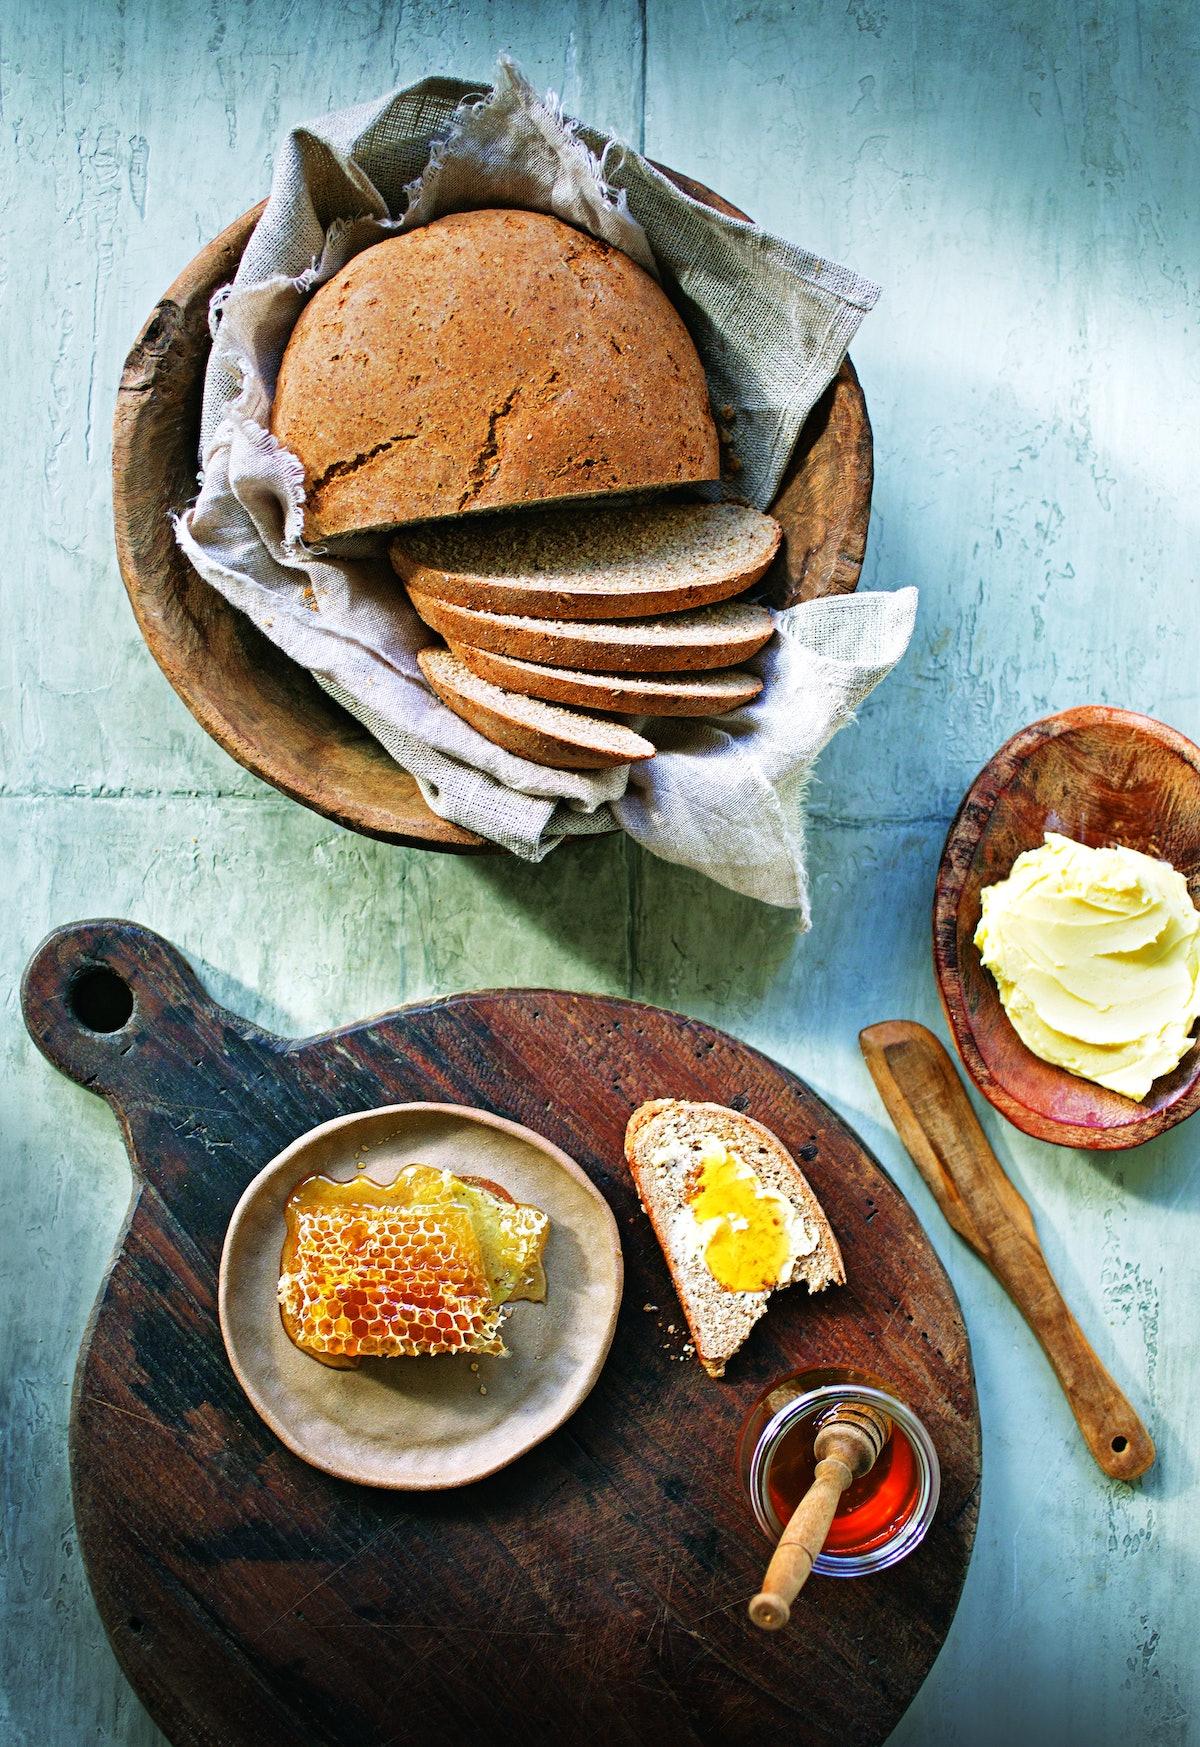 7 © Robyn Lea - Farmhouse Rye Bread - Props styling Bec Cole - Food styling Deb Kaloper.jpg